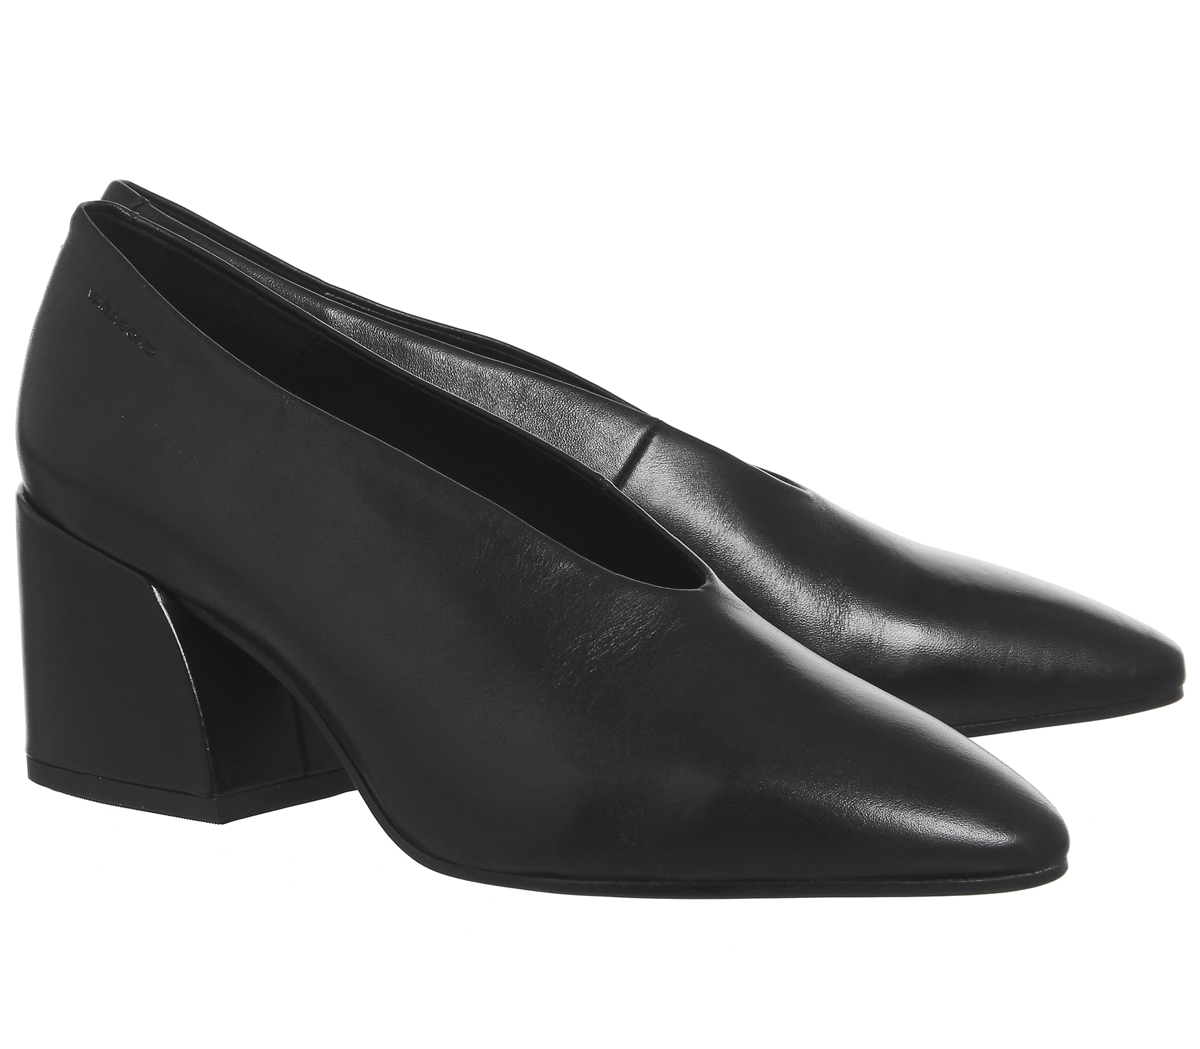 7482d10ddb77 Womens Vagabond Olivia Block Heels Black Leather Heels